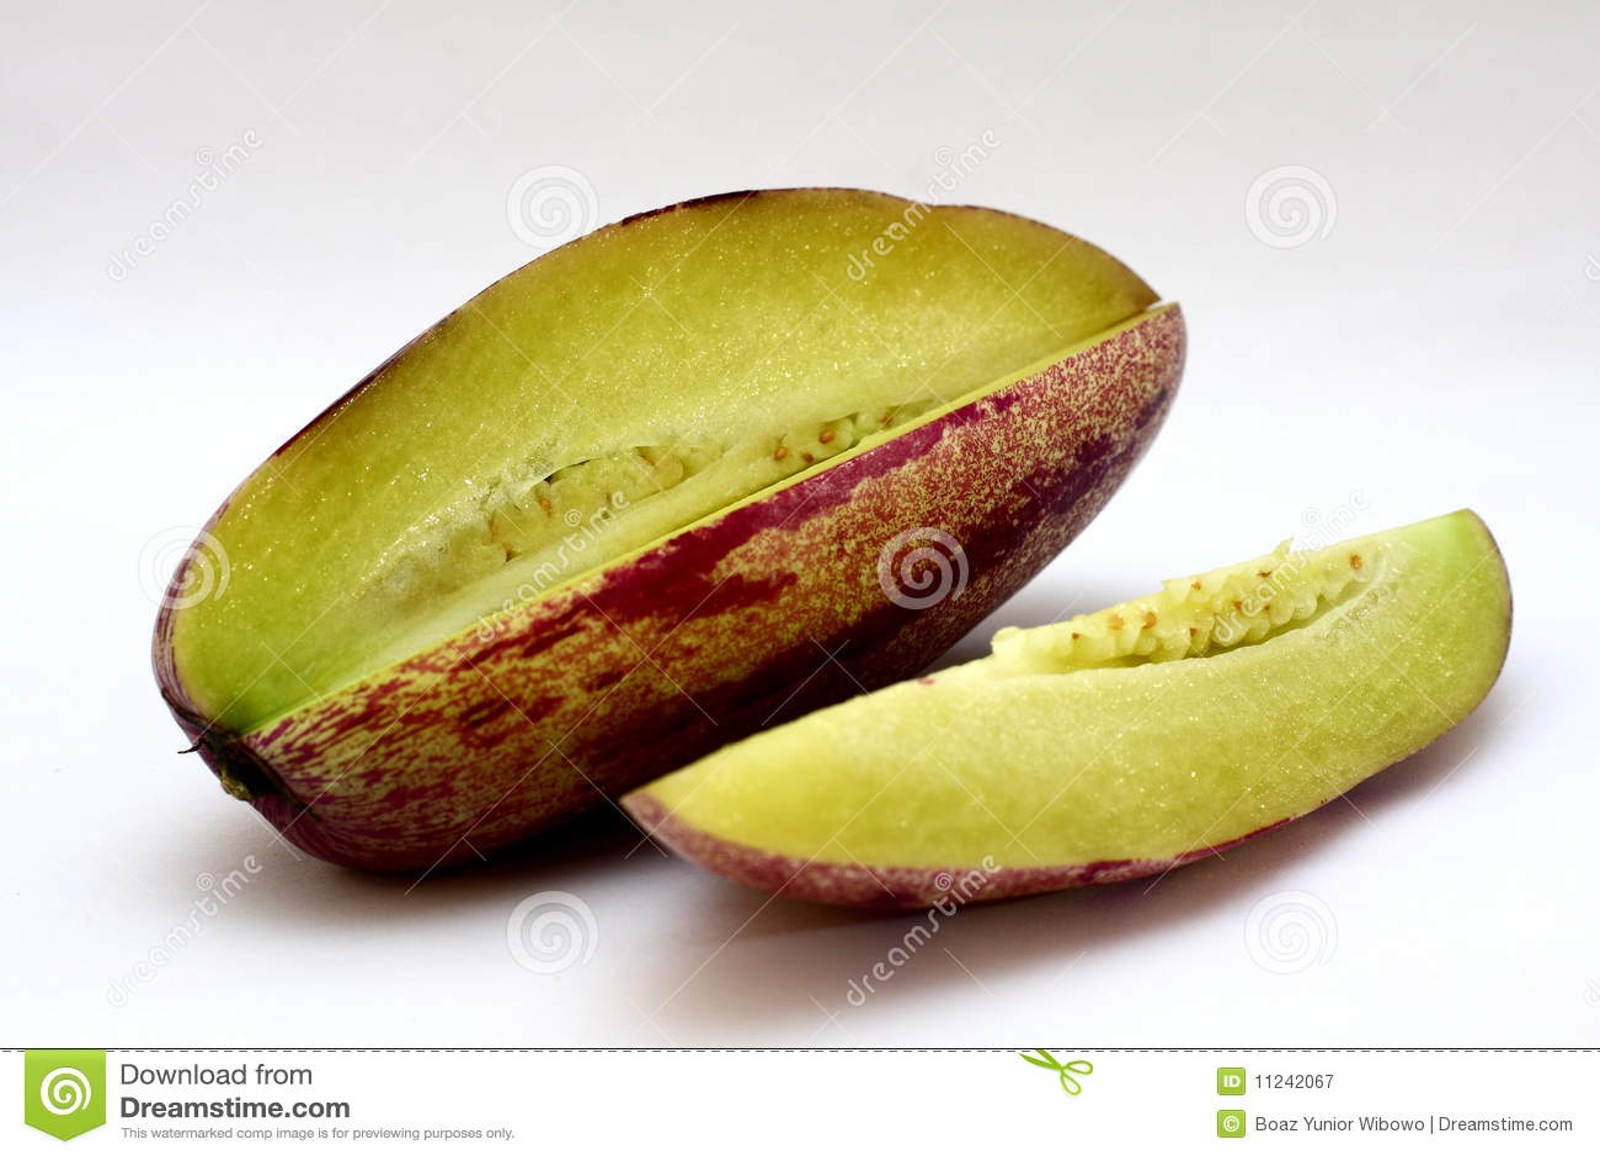 how to cut pepino melon